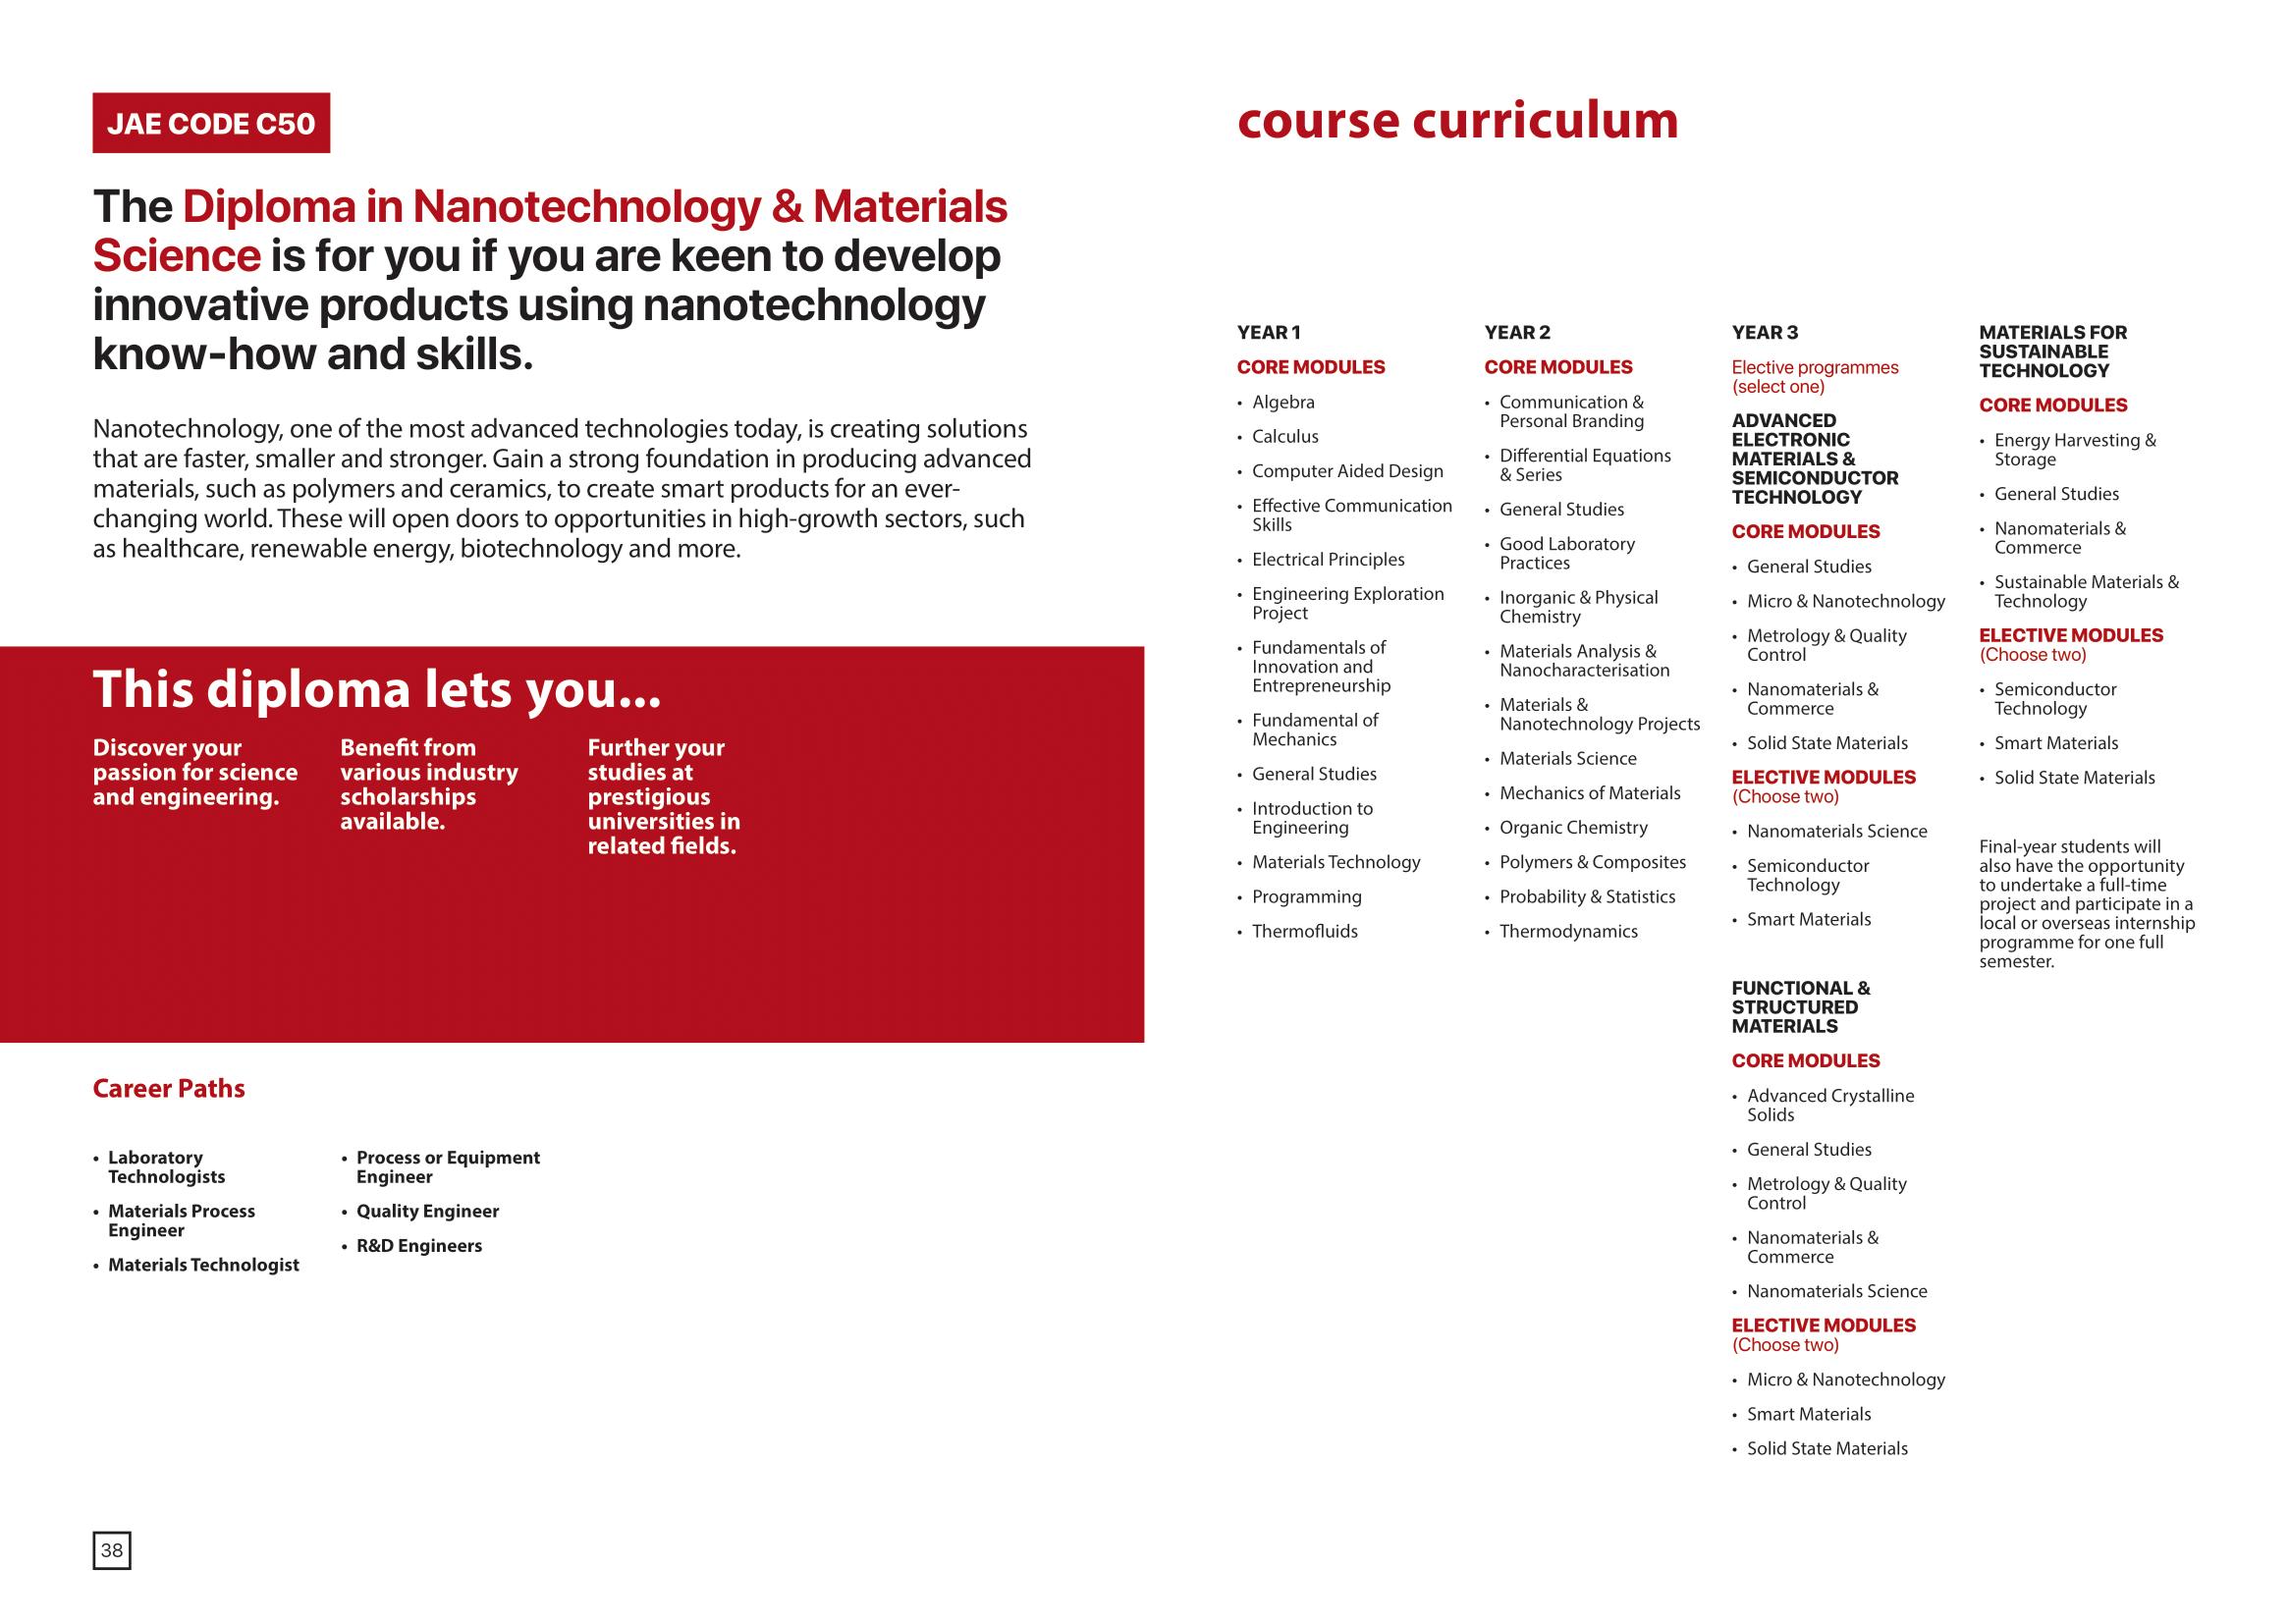 School of Engineering 2020-21